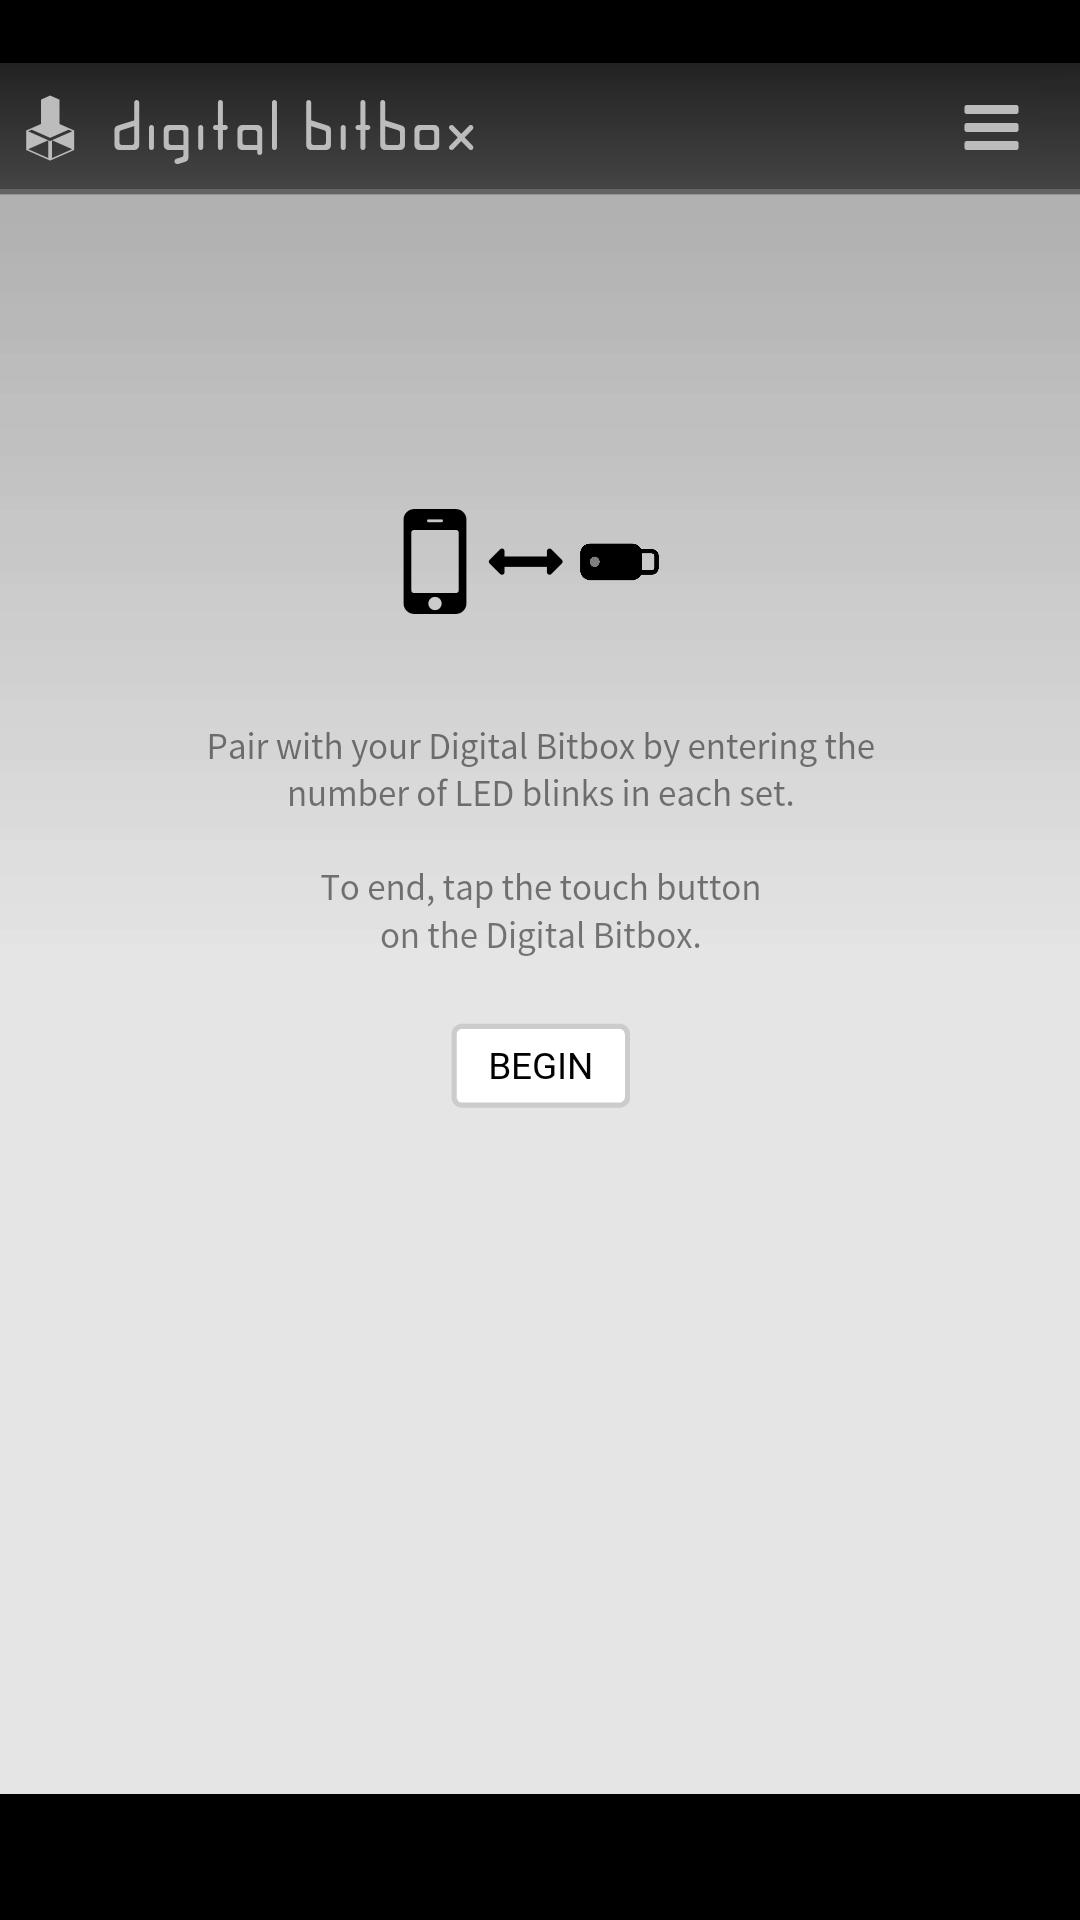 Digital Bitbox Mobile App Setup 3